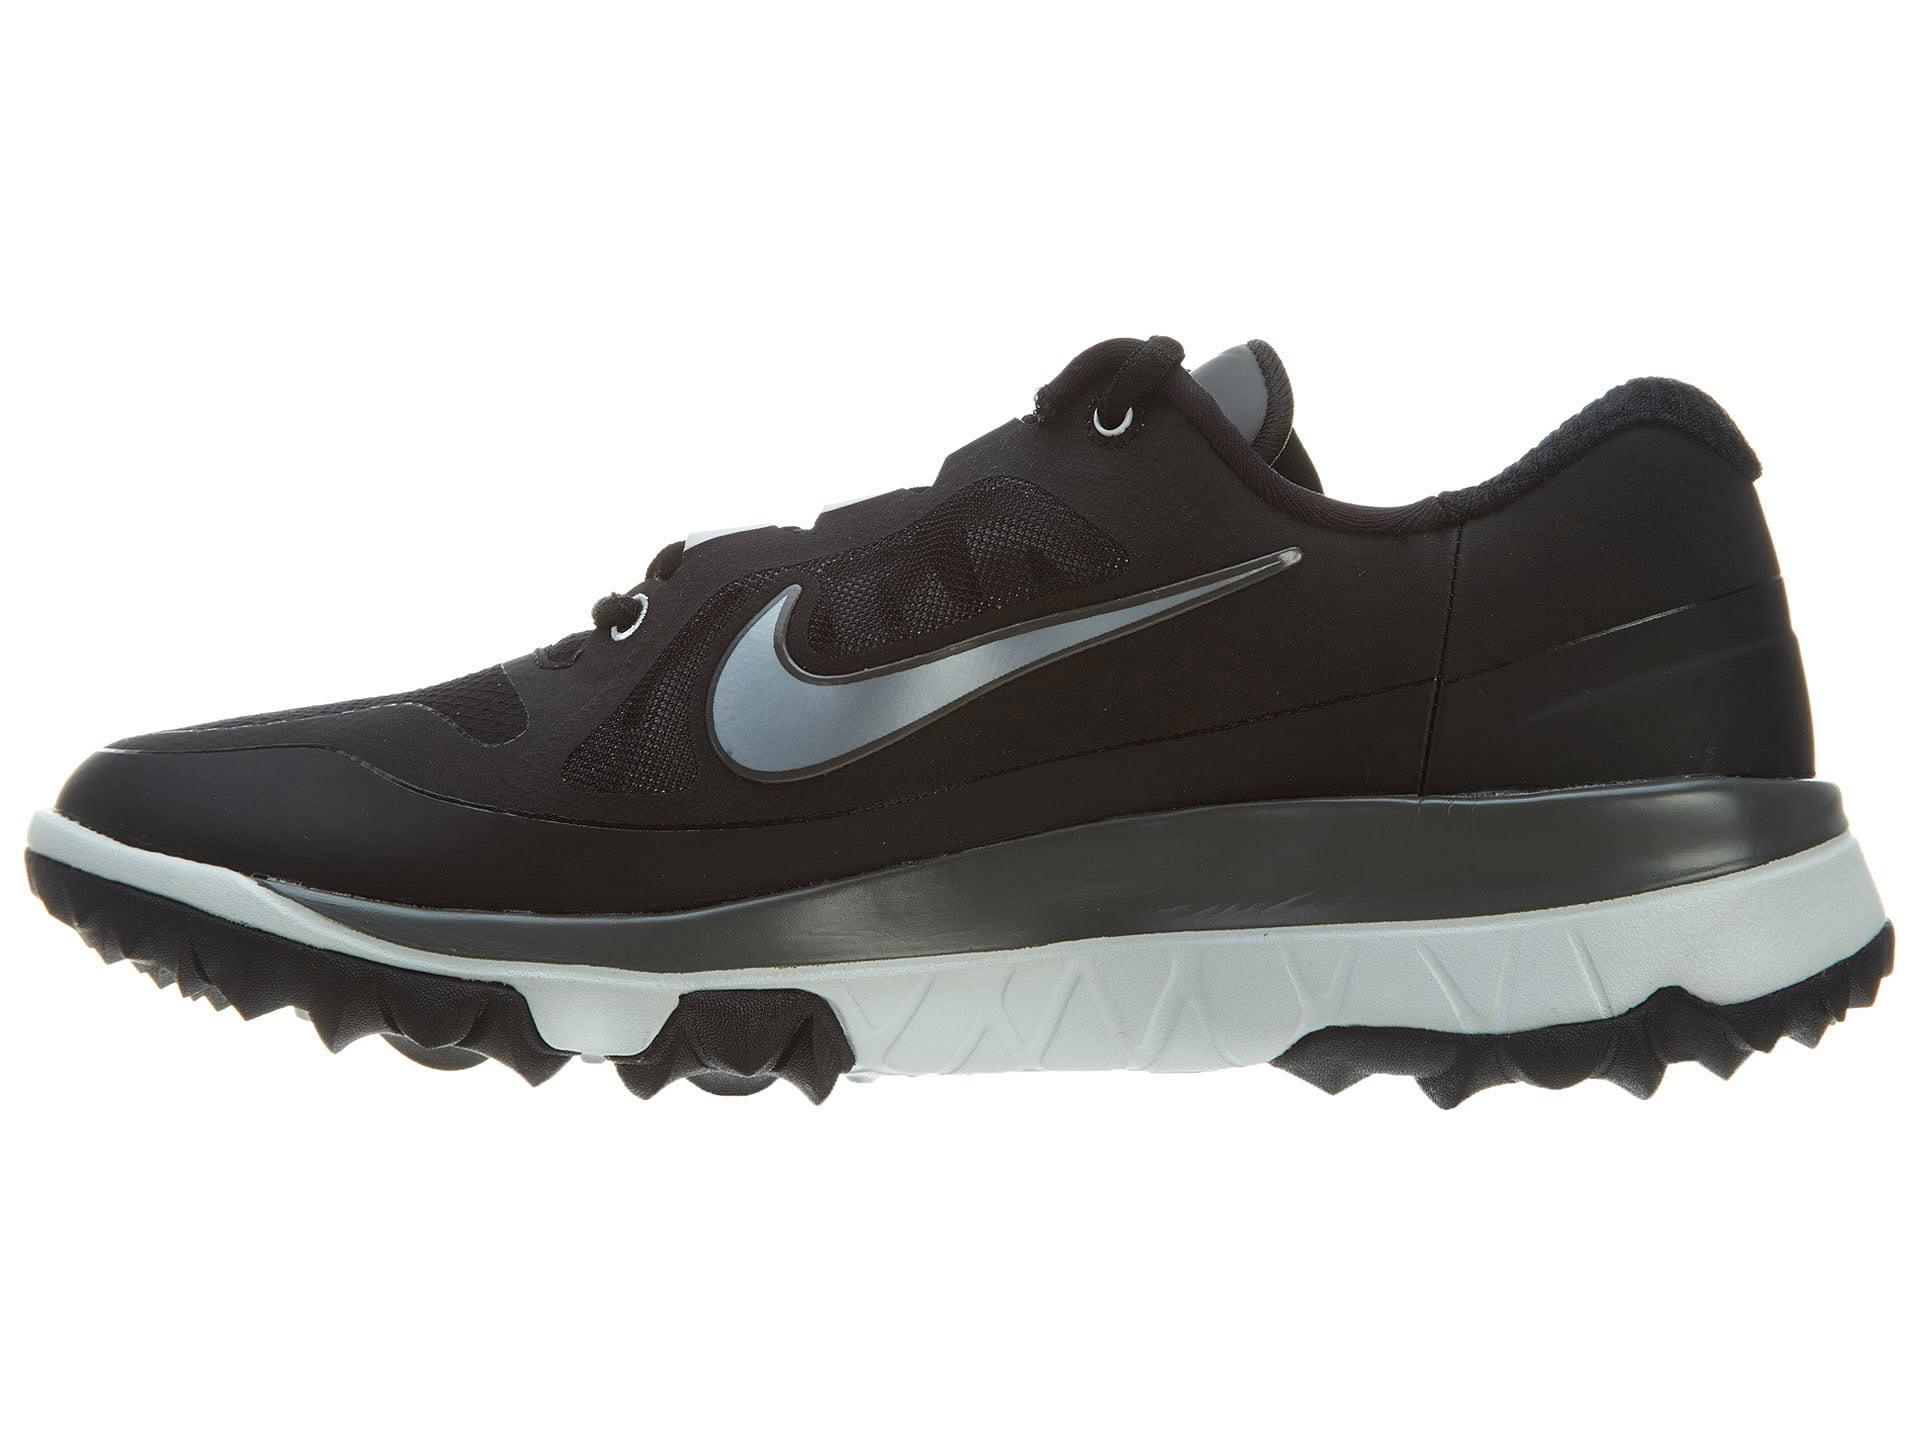 Nike Fi Impact Mens Style : 611510